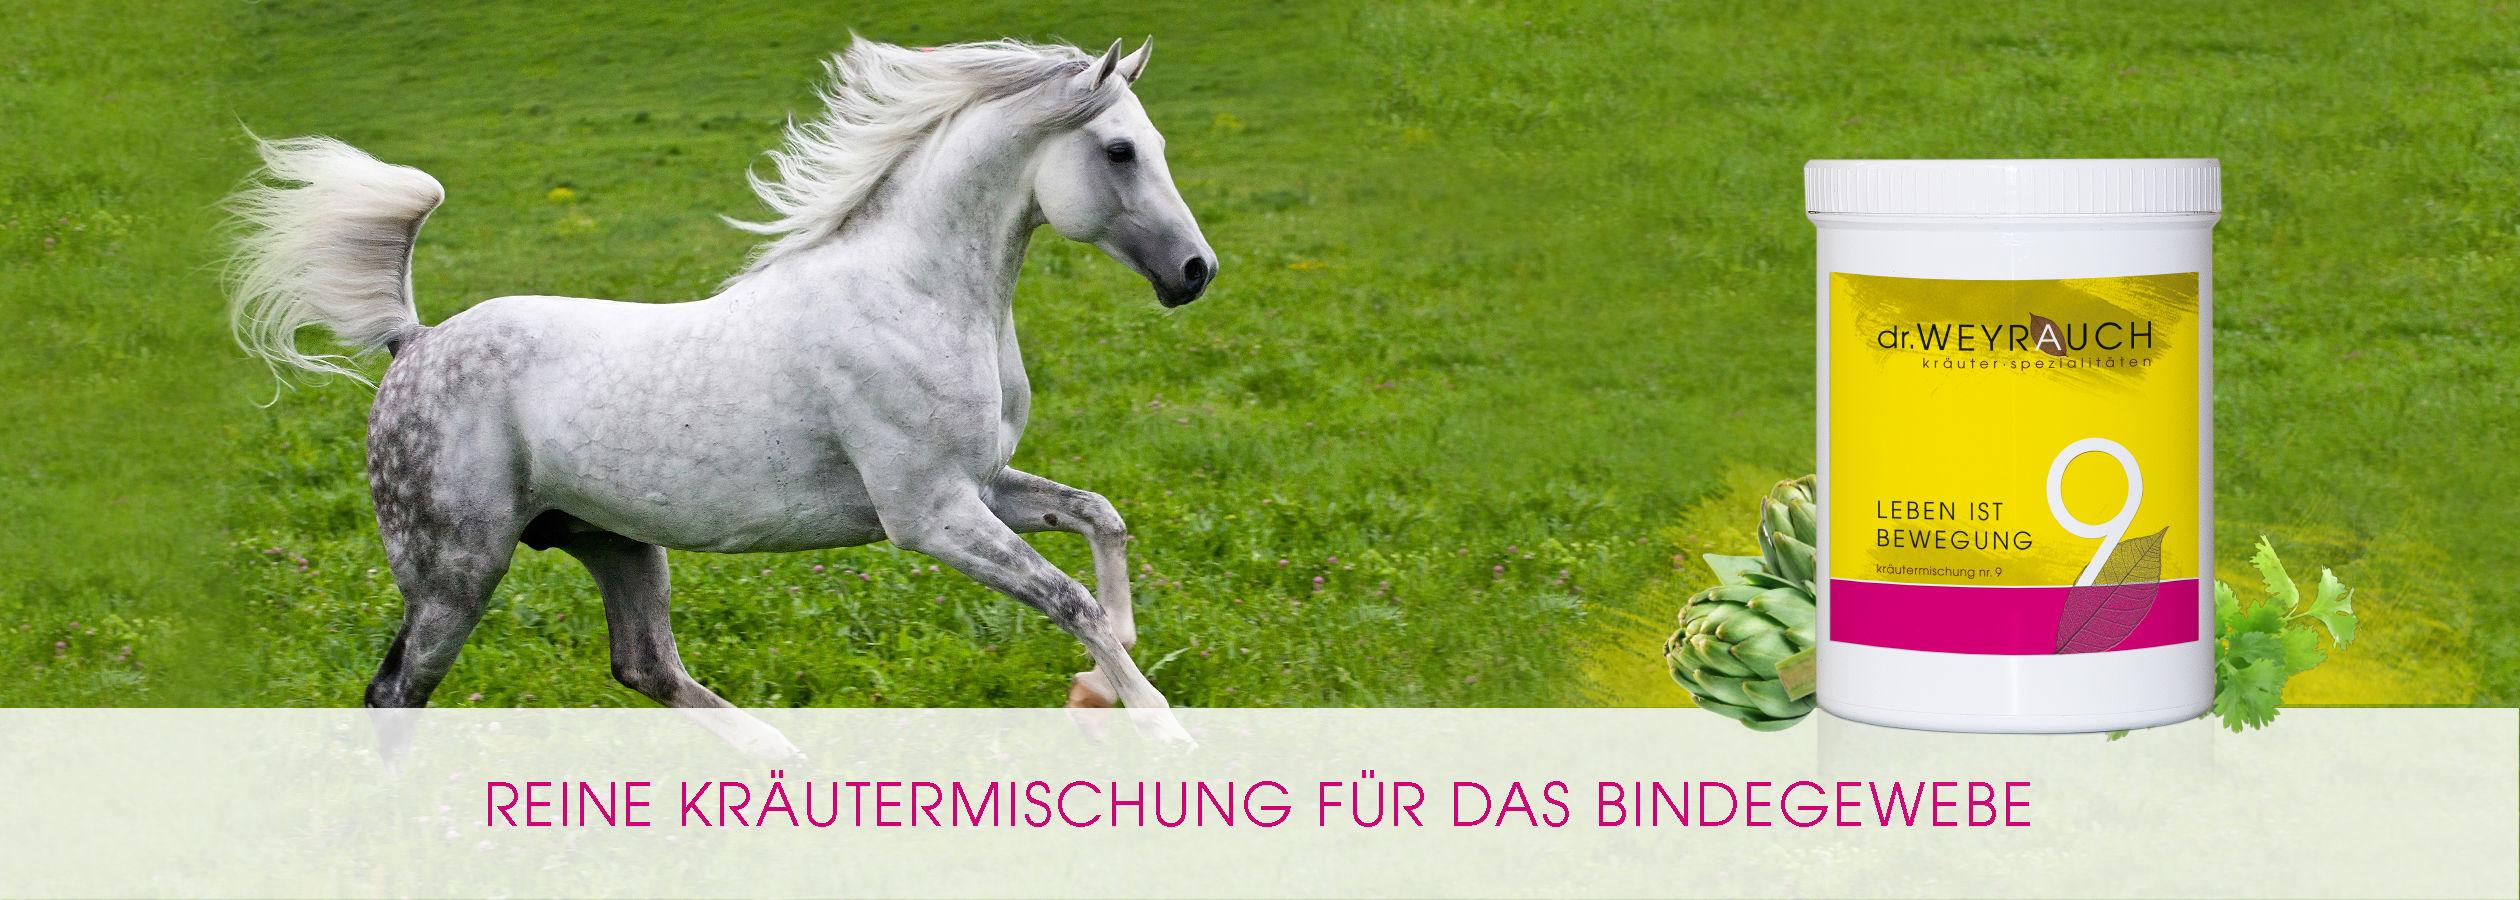 HEADER-2017-Leben-ist-Bewegung-Pferd